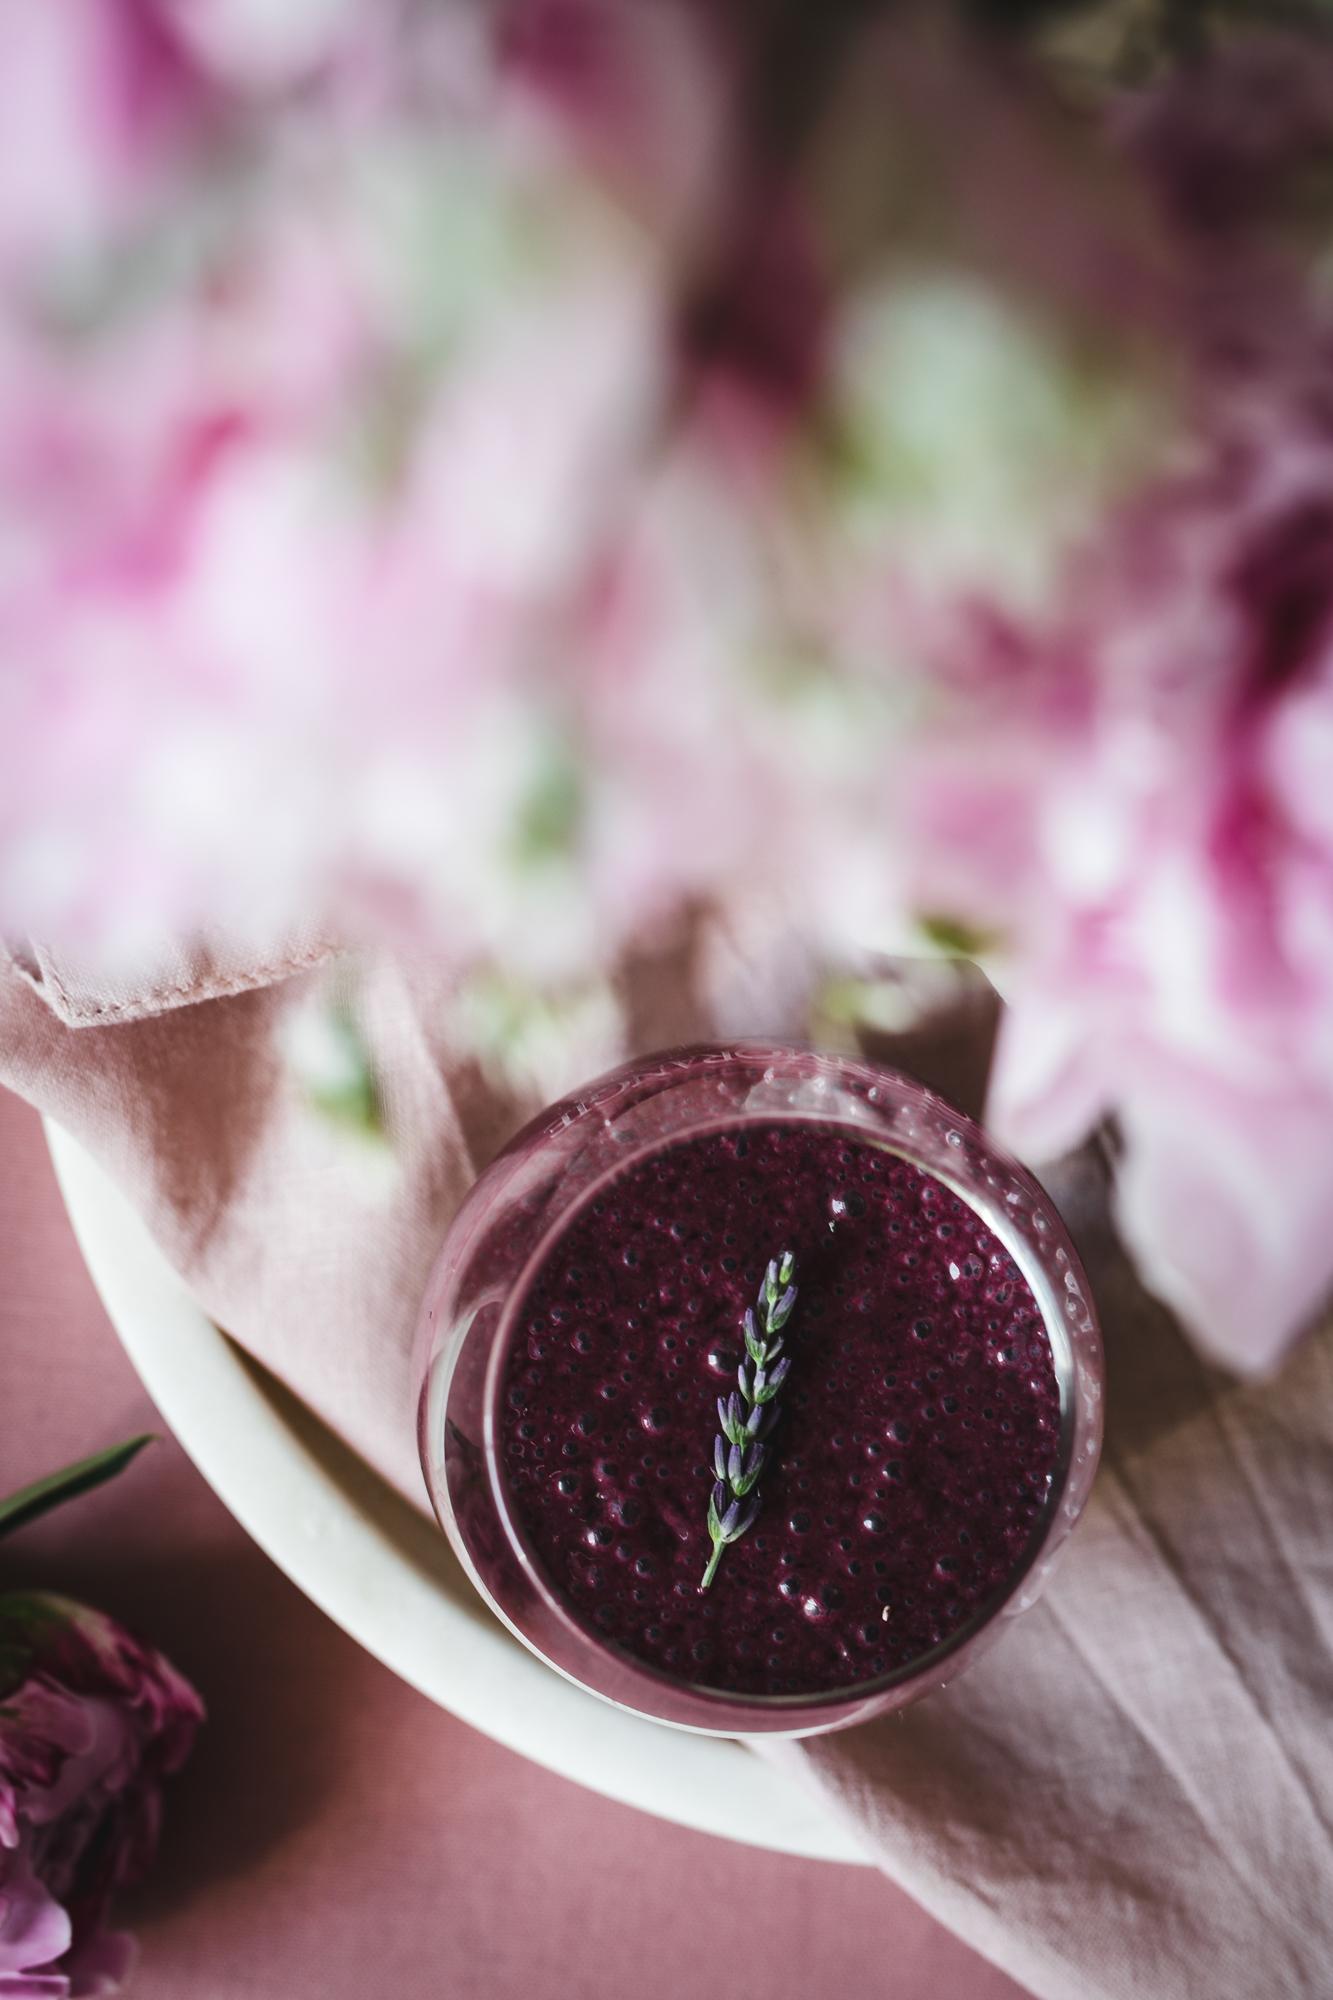 Jagodowy koktajl z nasionami chia i kardamonem